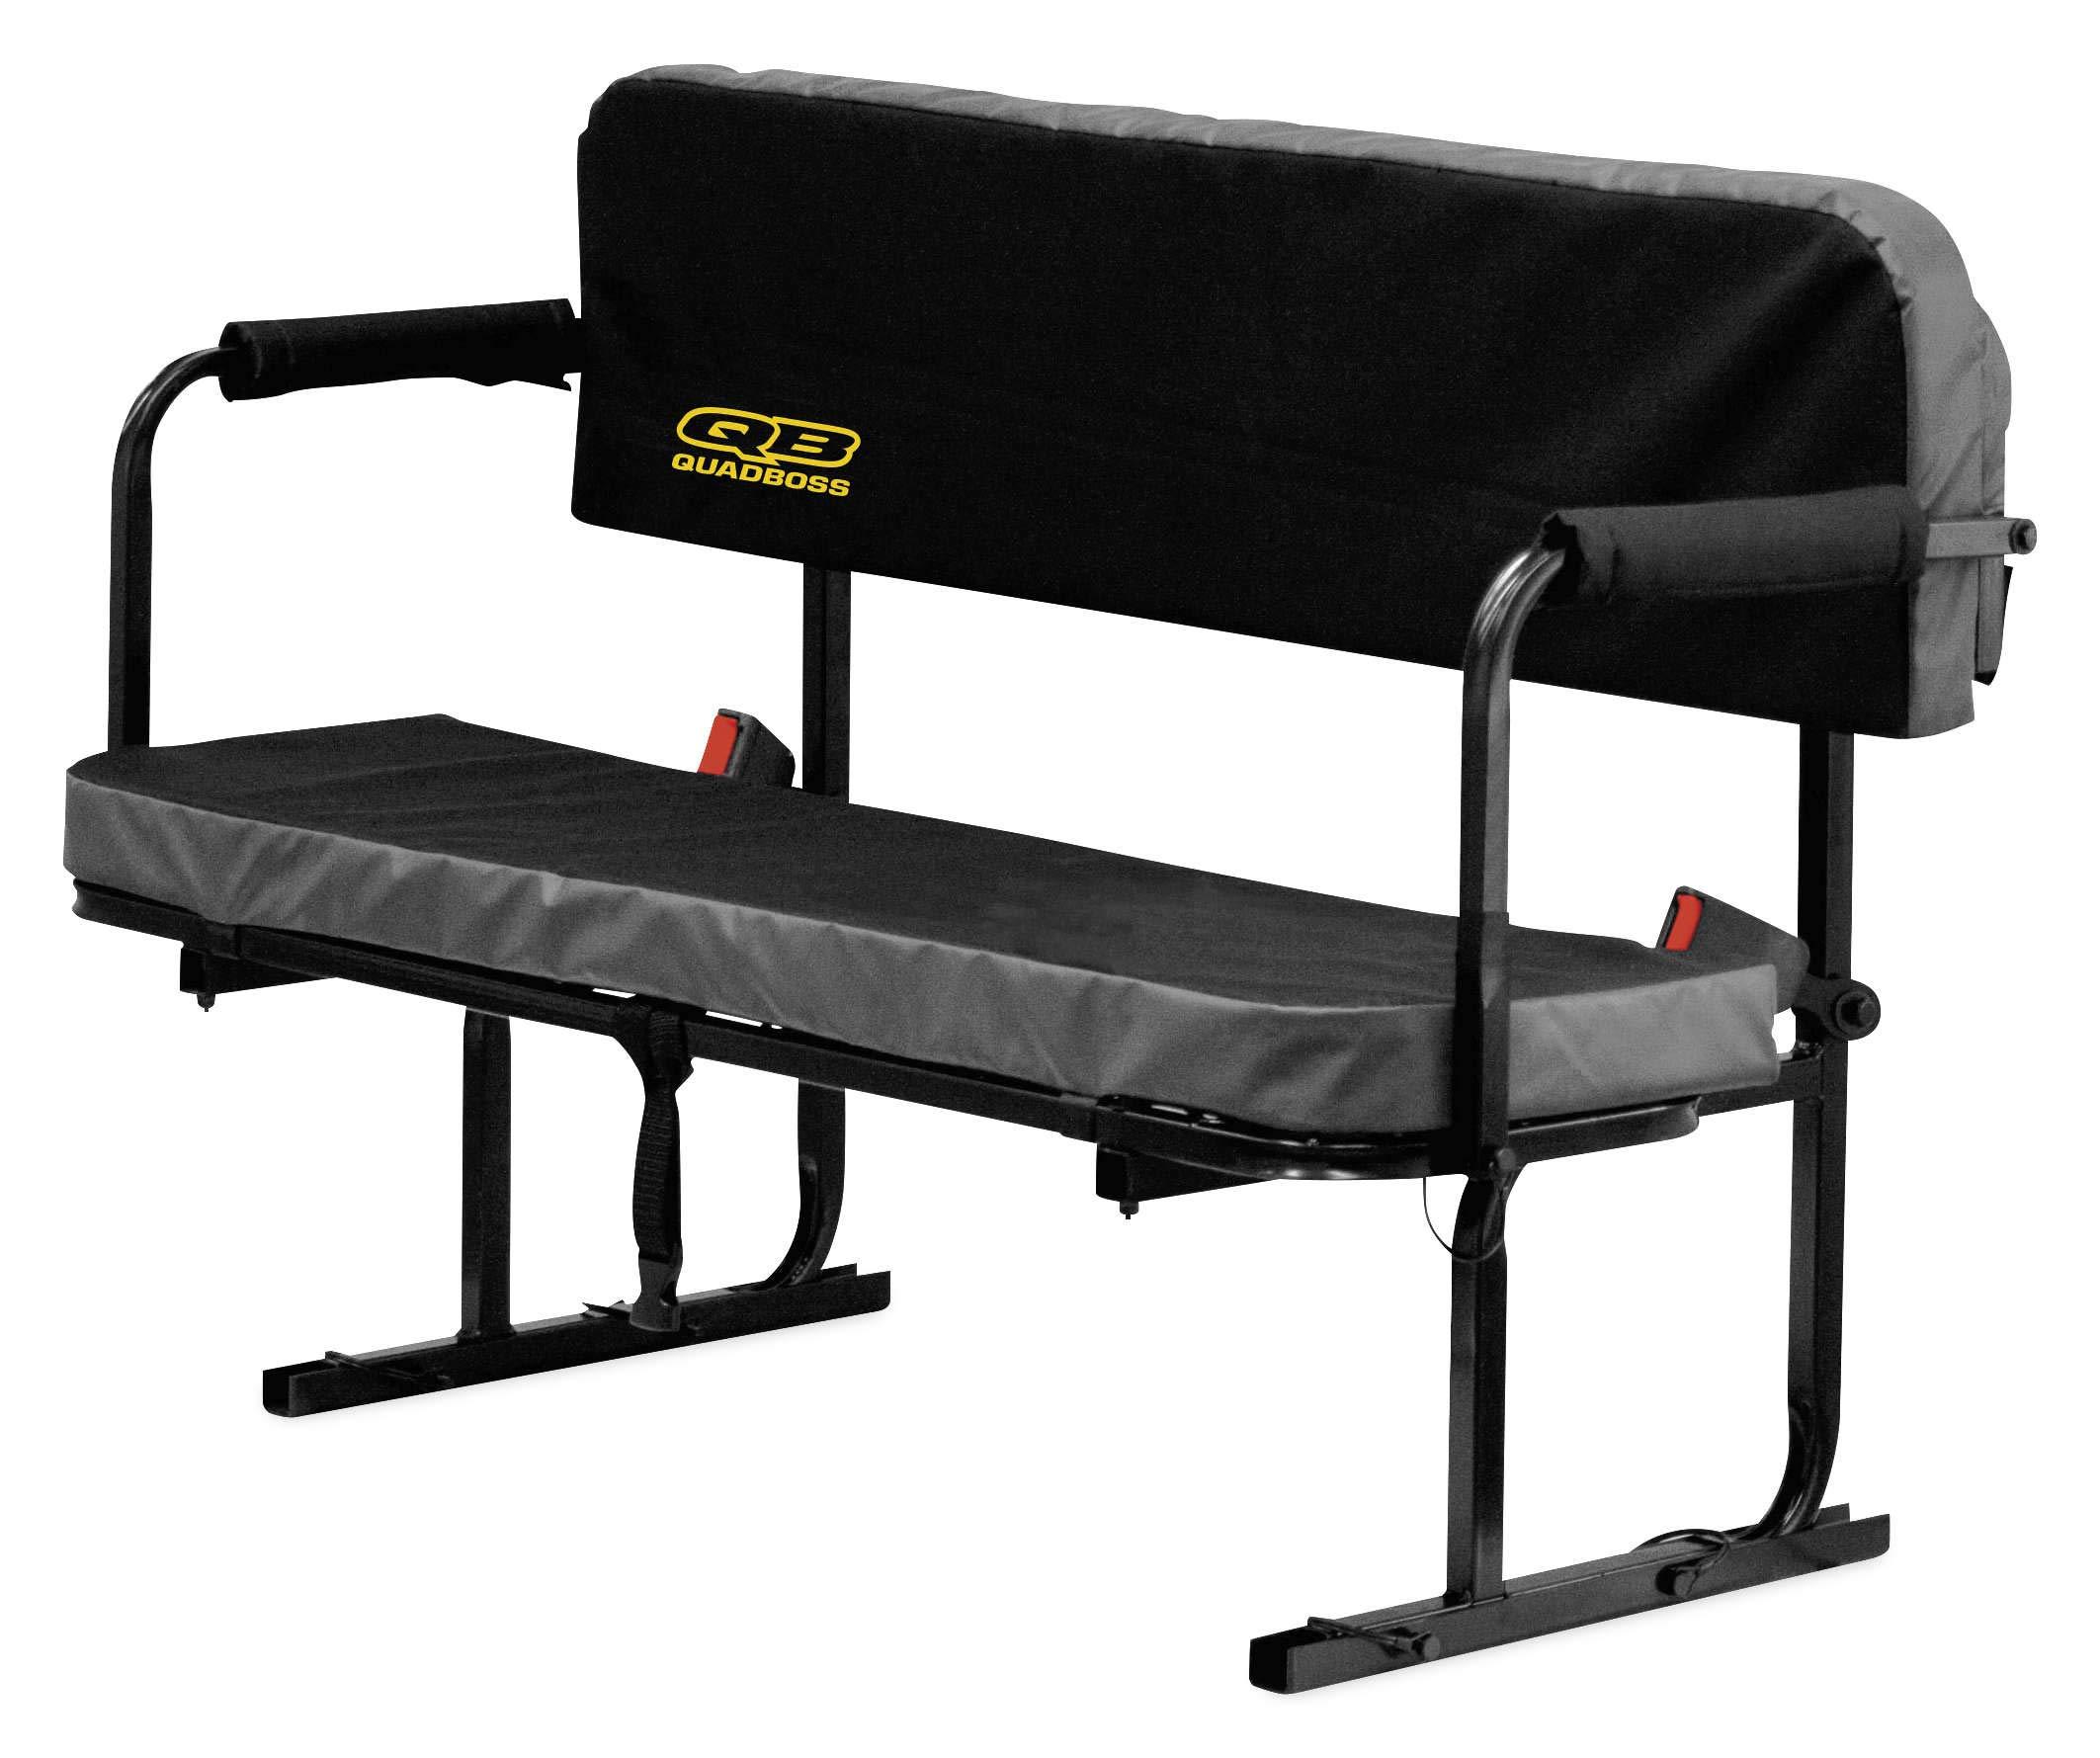 QuadBoss UTV Jump Seat (Black)